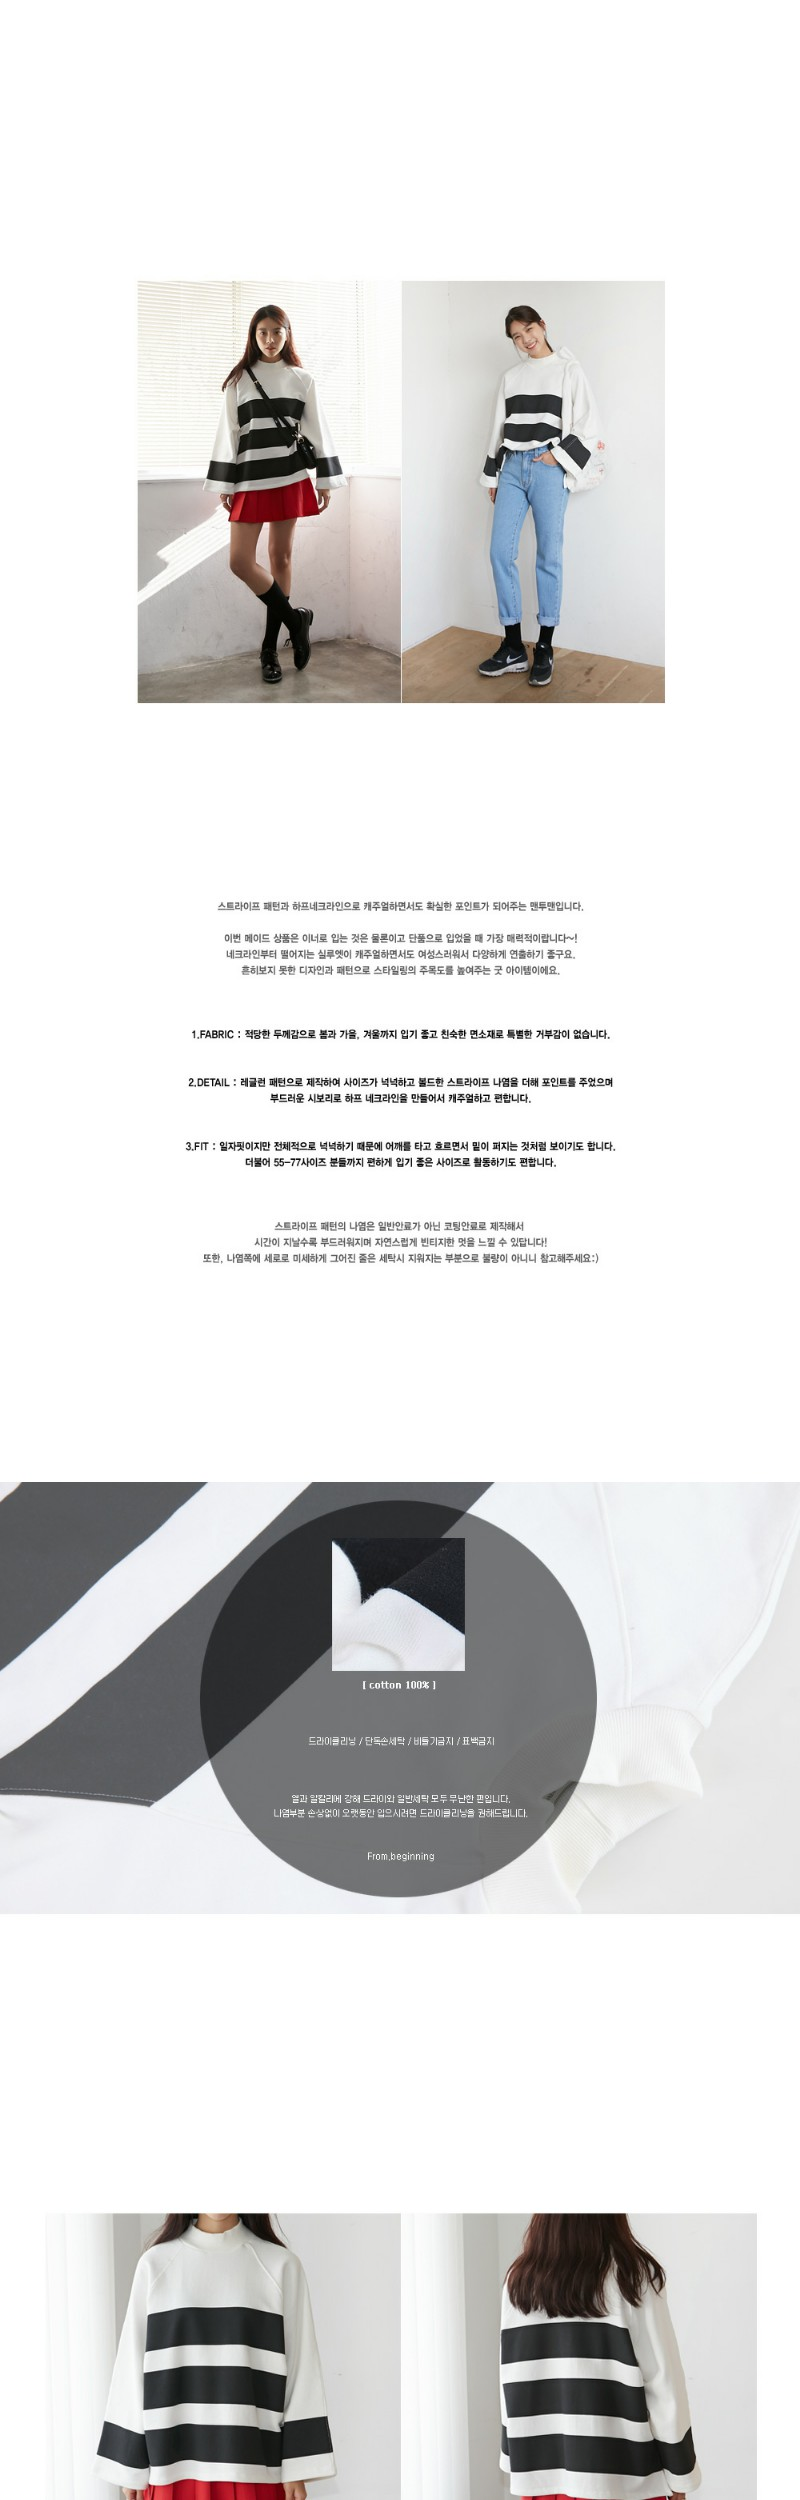 Made_top-043_line printing mtm